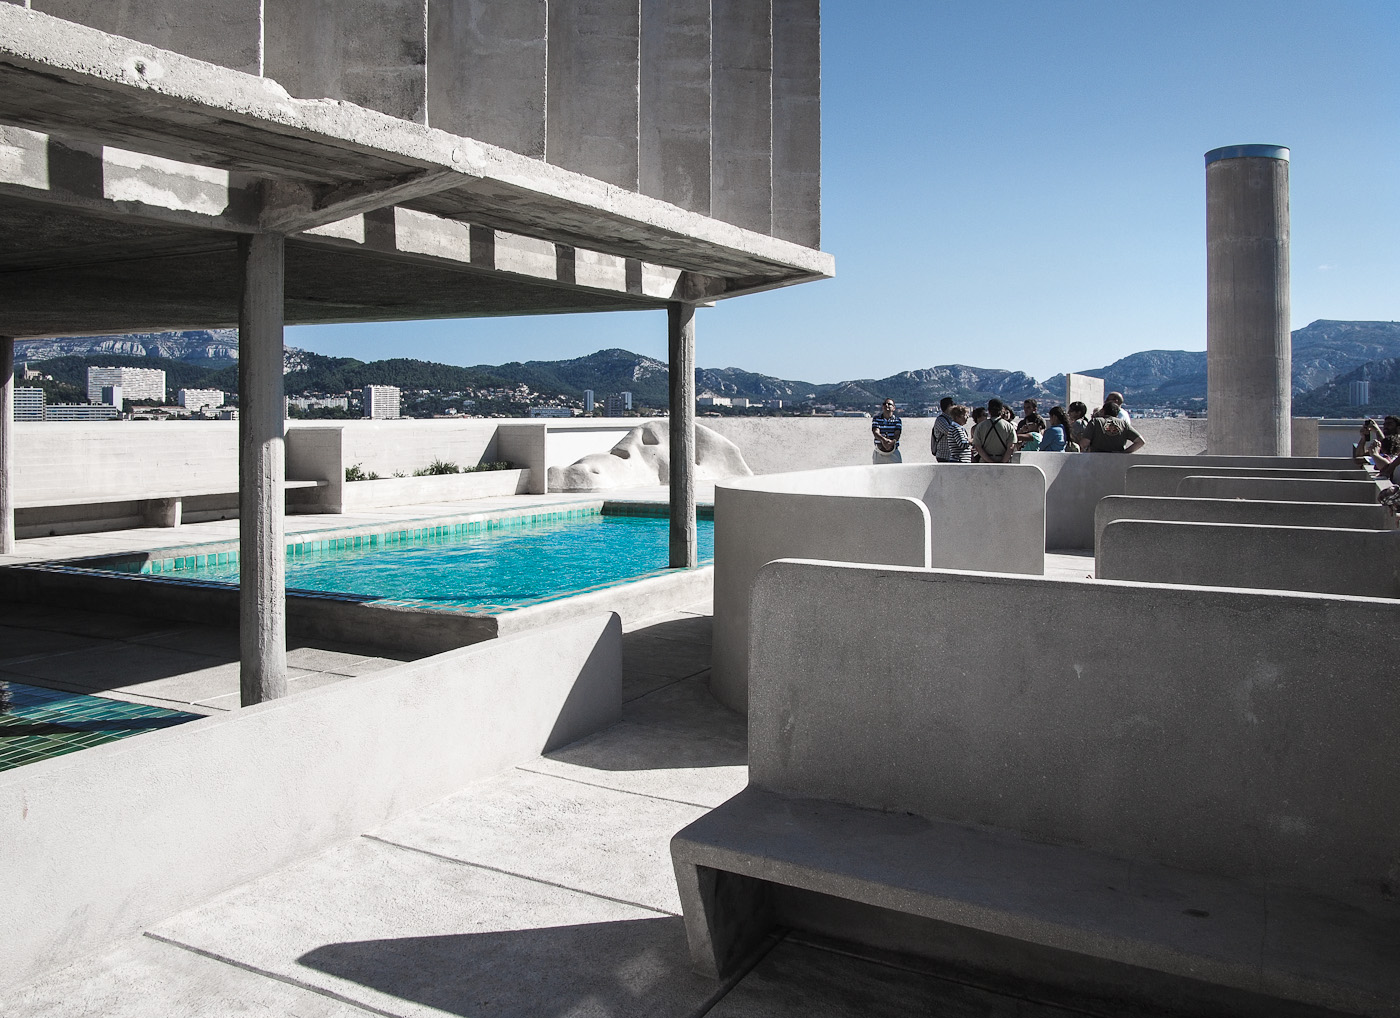 The elementary school on the roof of Le Corbusier's La Cité Radieuse, Marseilles. Olympus OM-D EM-5.